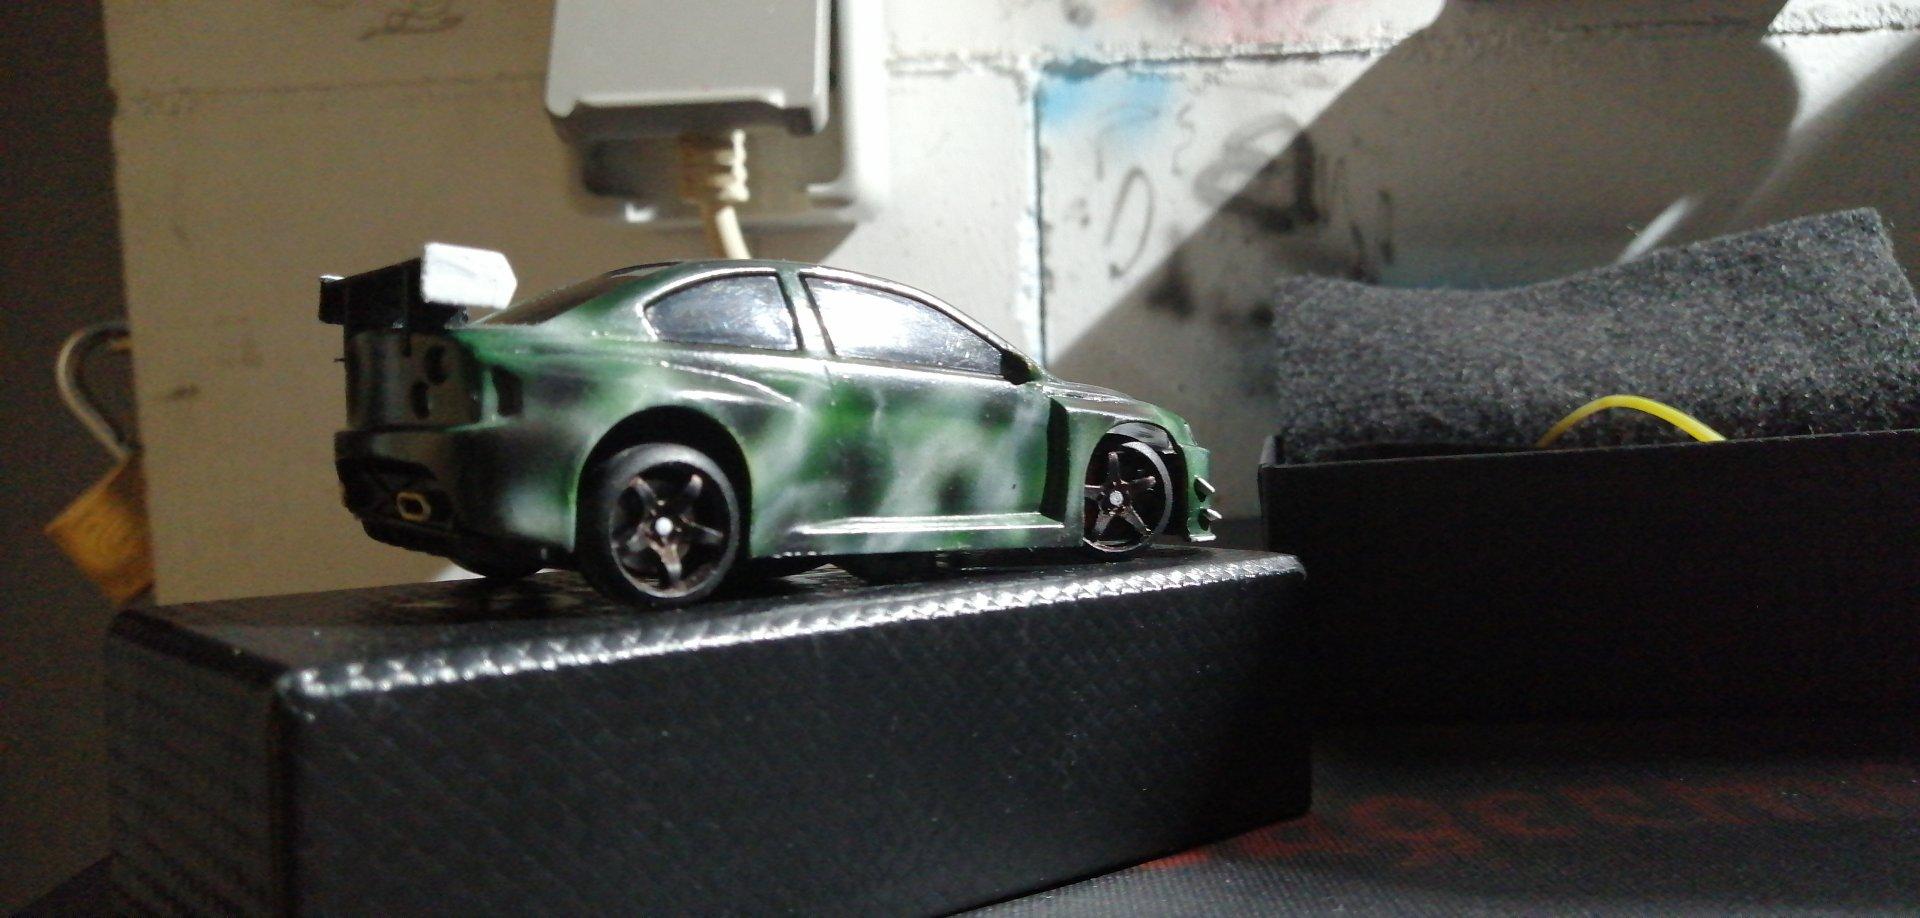 Smovz's Cars